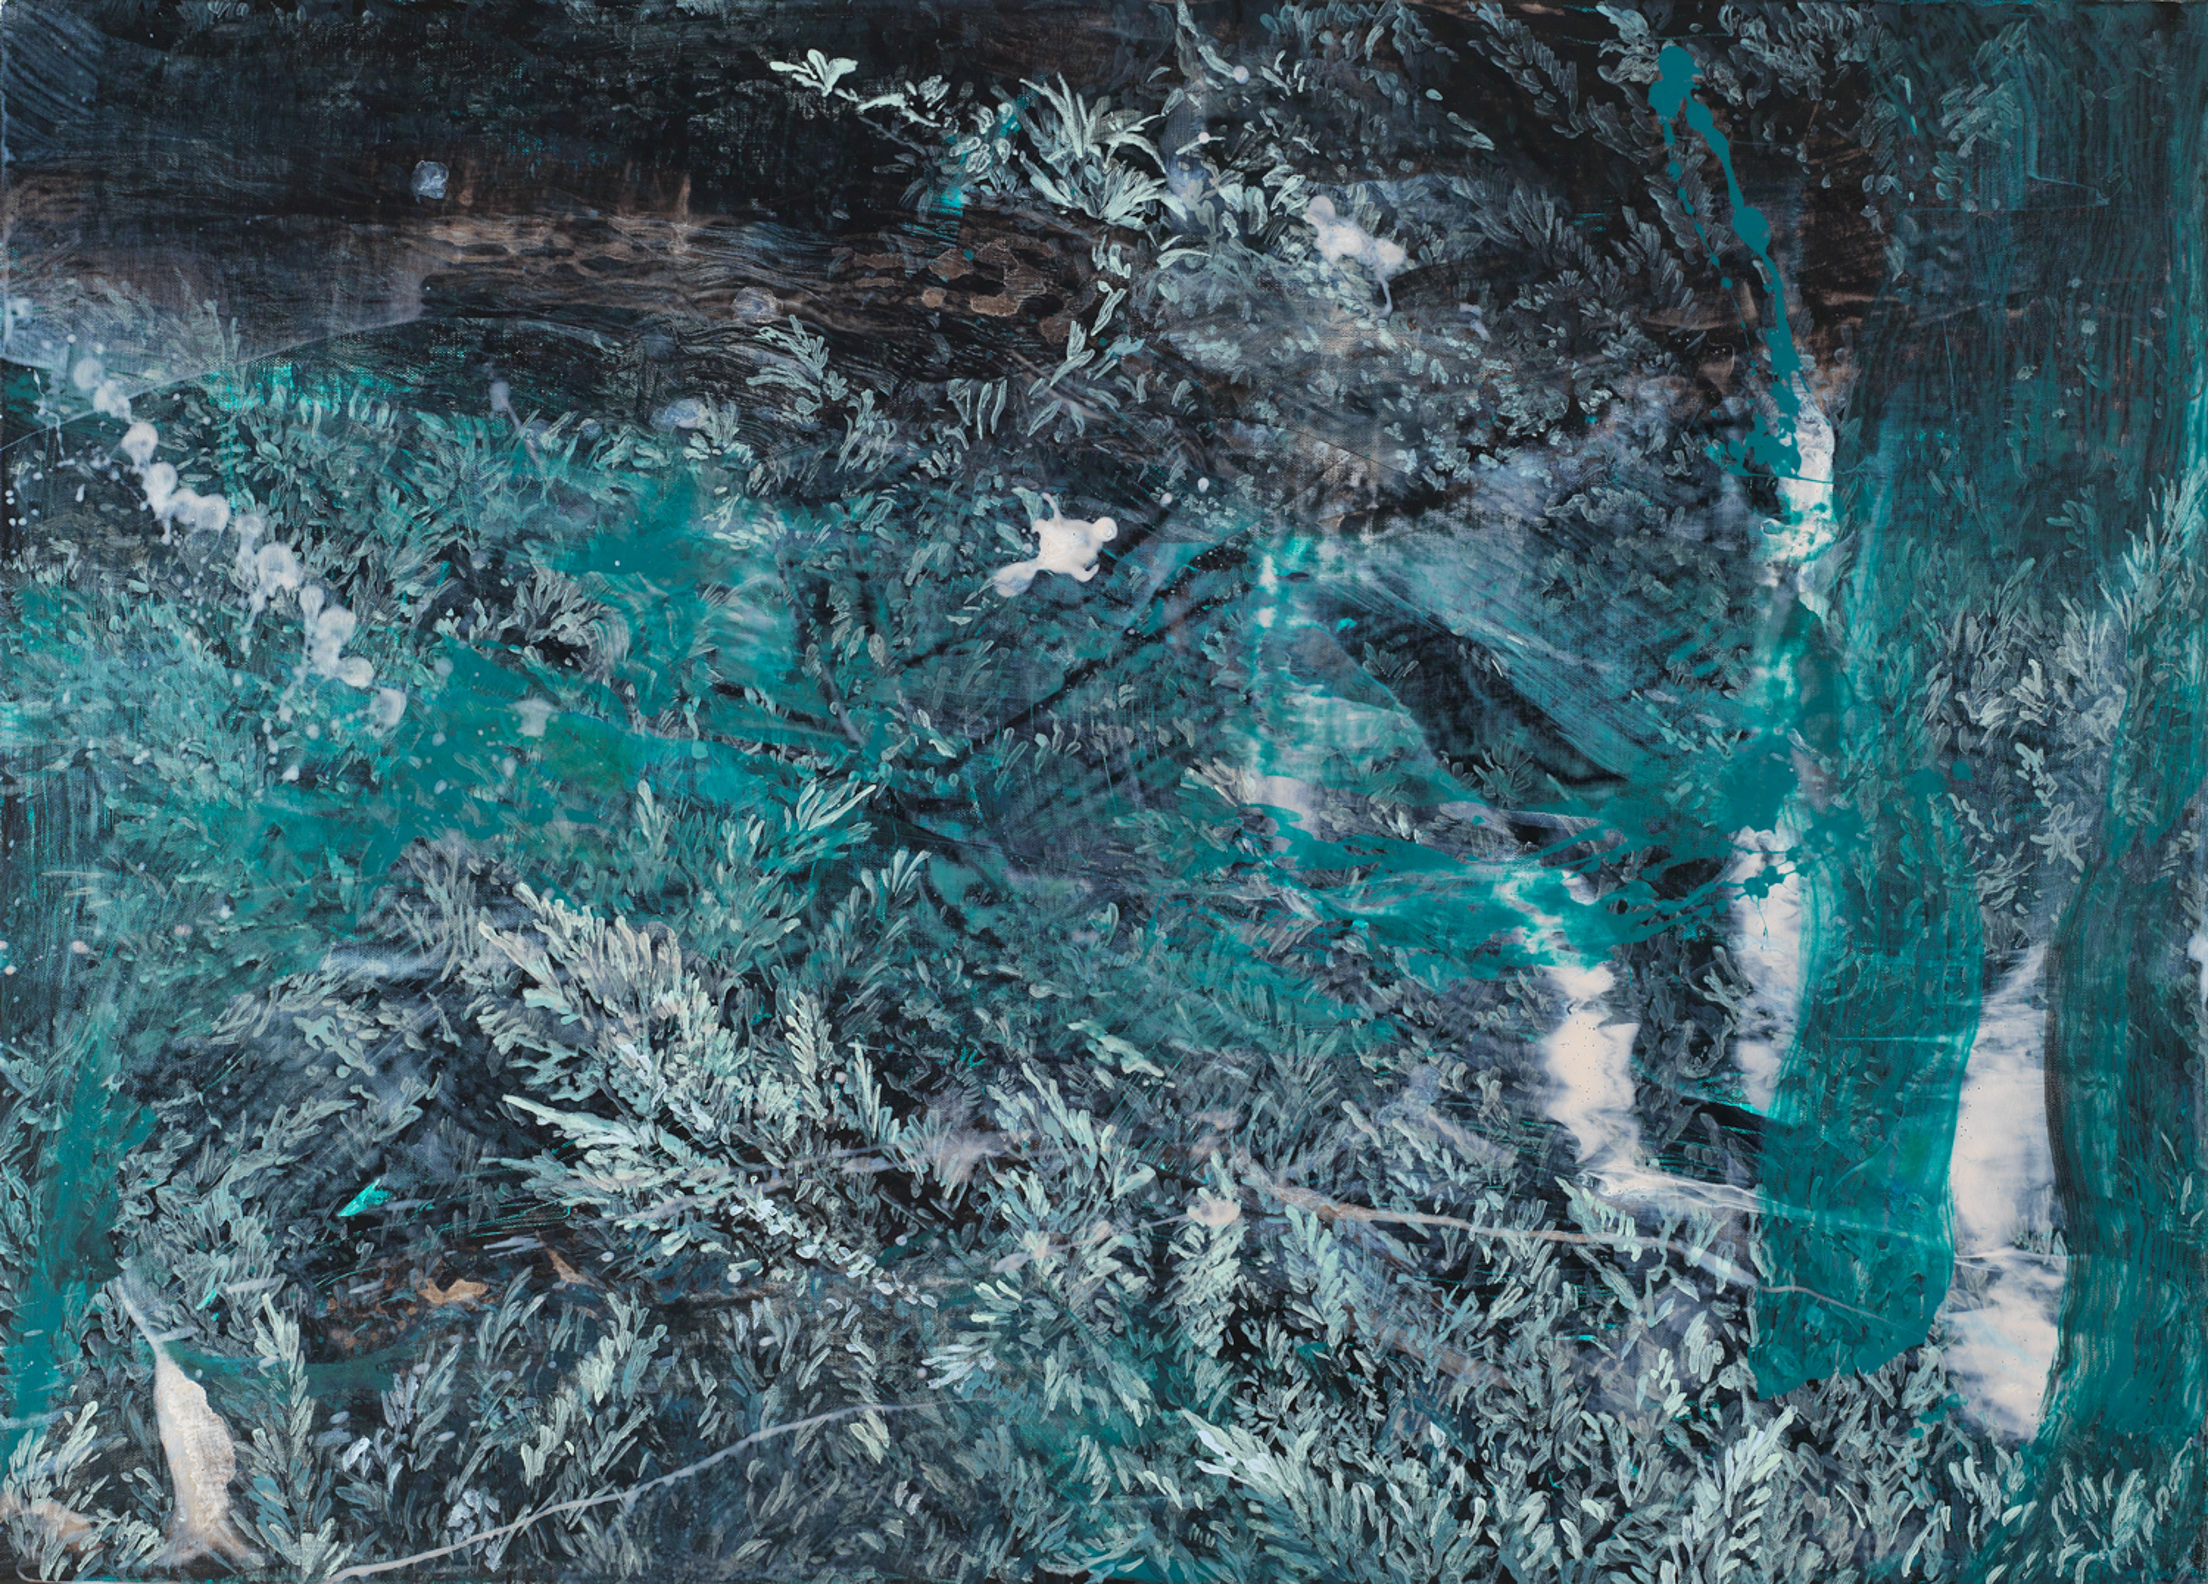 Forest #4 | 森林 #4, 2015, Acrylic on Canvas, 65 x 91 cm, SHIU Sheng Hung | 許聖泓